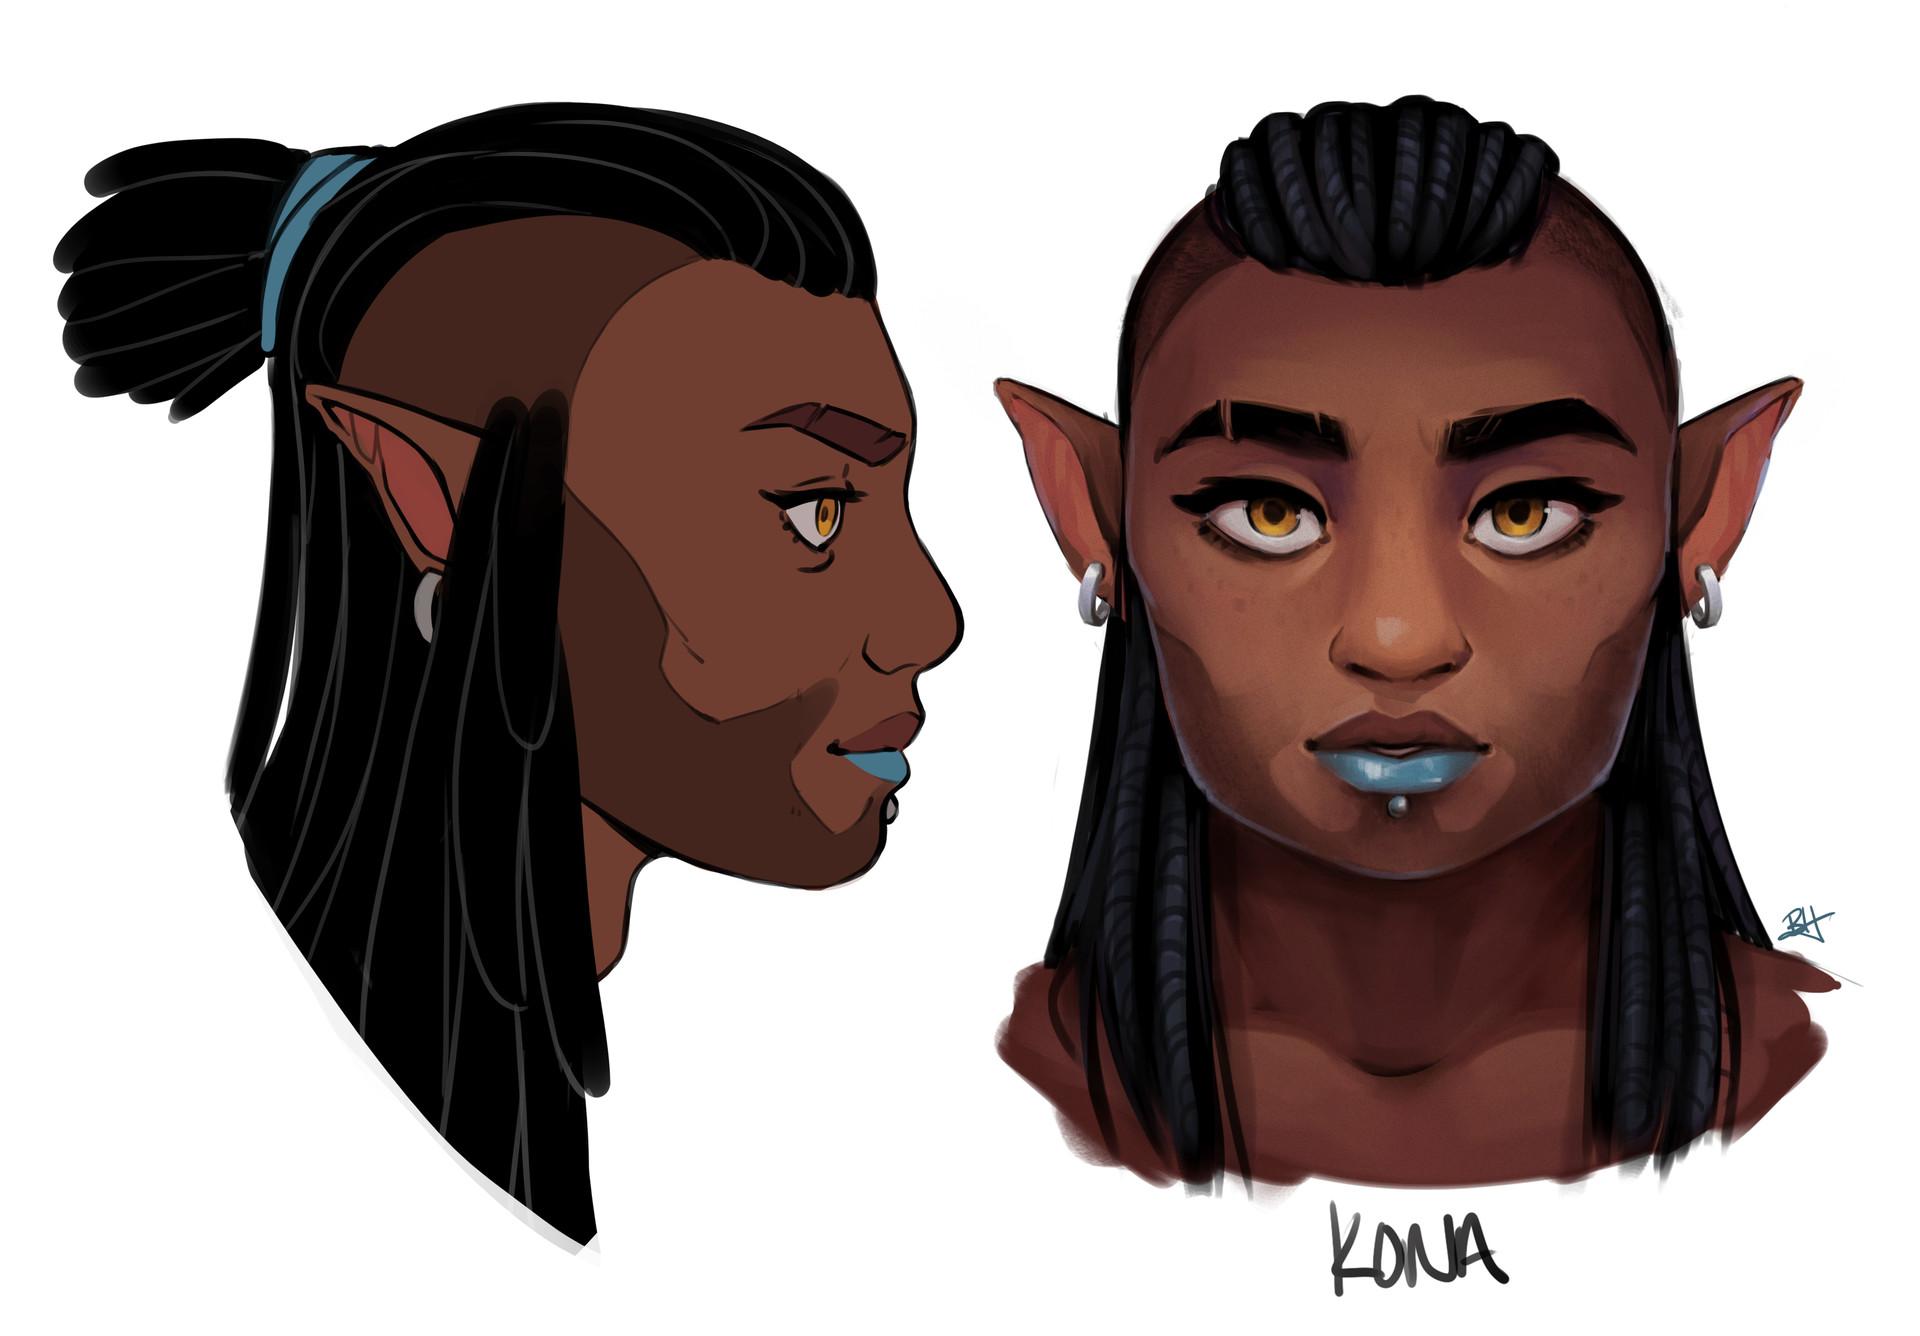 Character Design: Kona